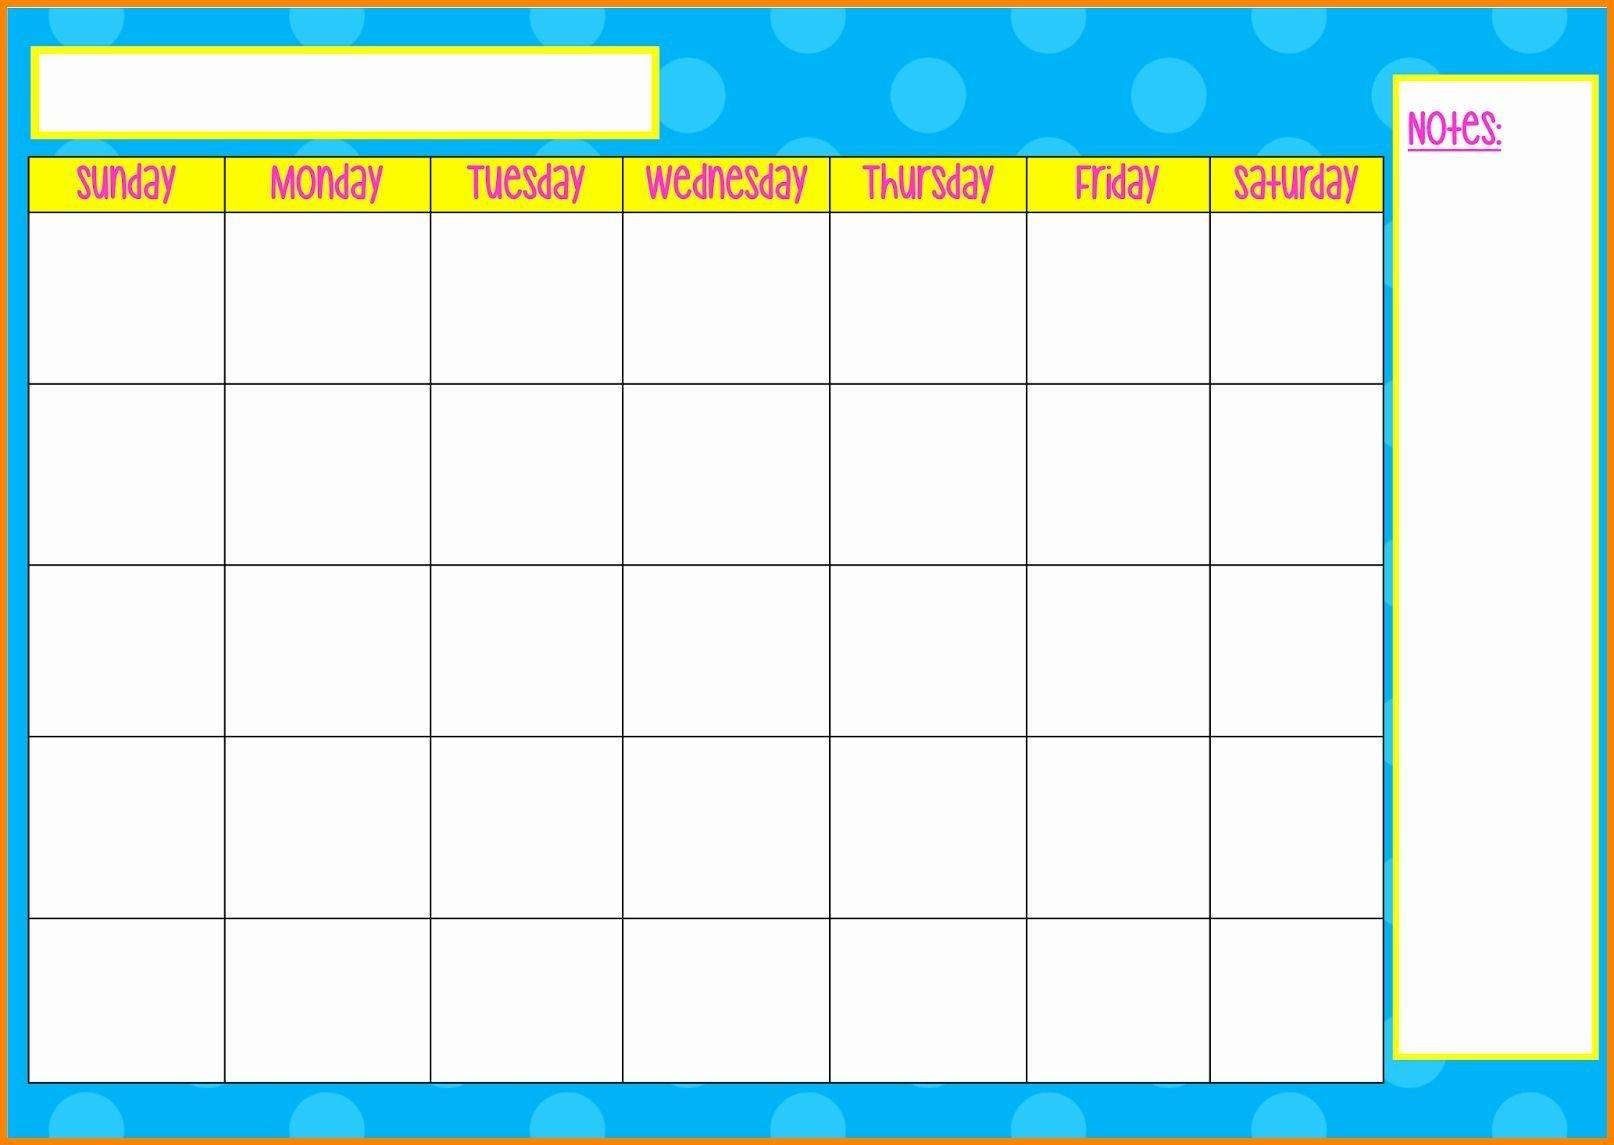 How To Monday Through Friday Calendar Word | Get Your Free Blank 1 Week Calendar Monday Through Friday